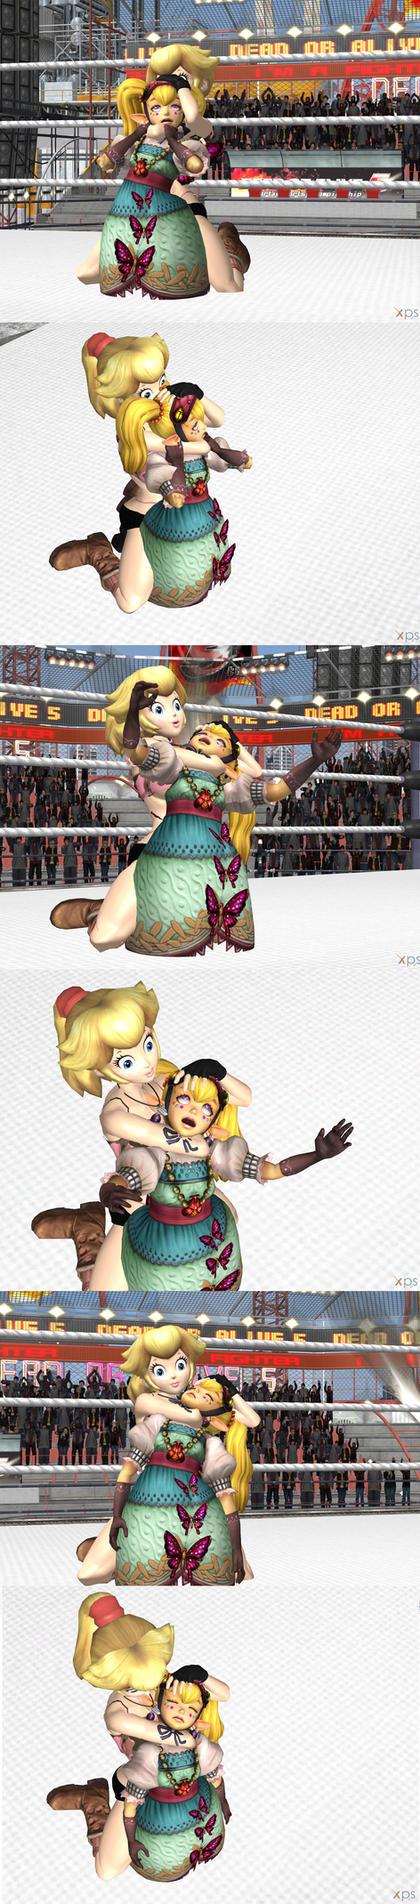 XPS wrestling: Peach Sleeperhold Agitha by fulgore12